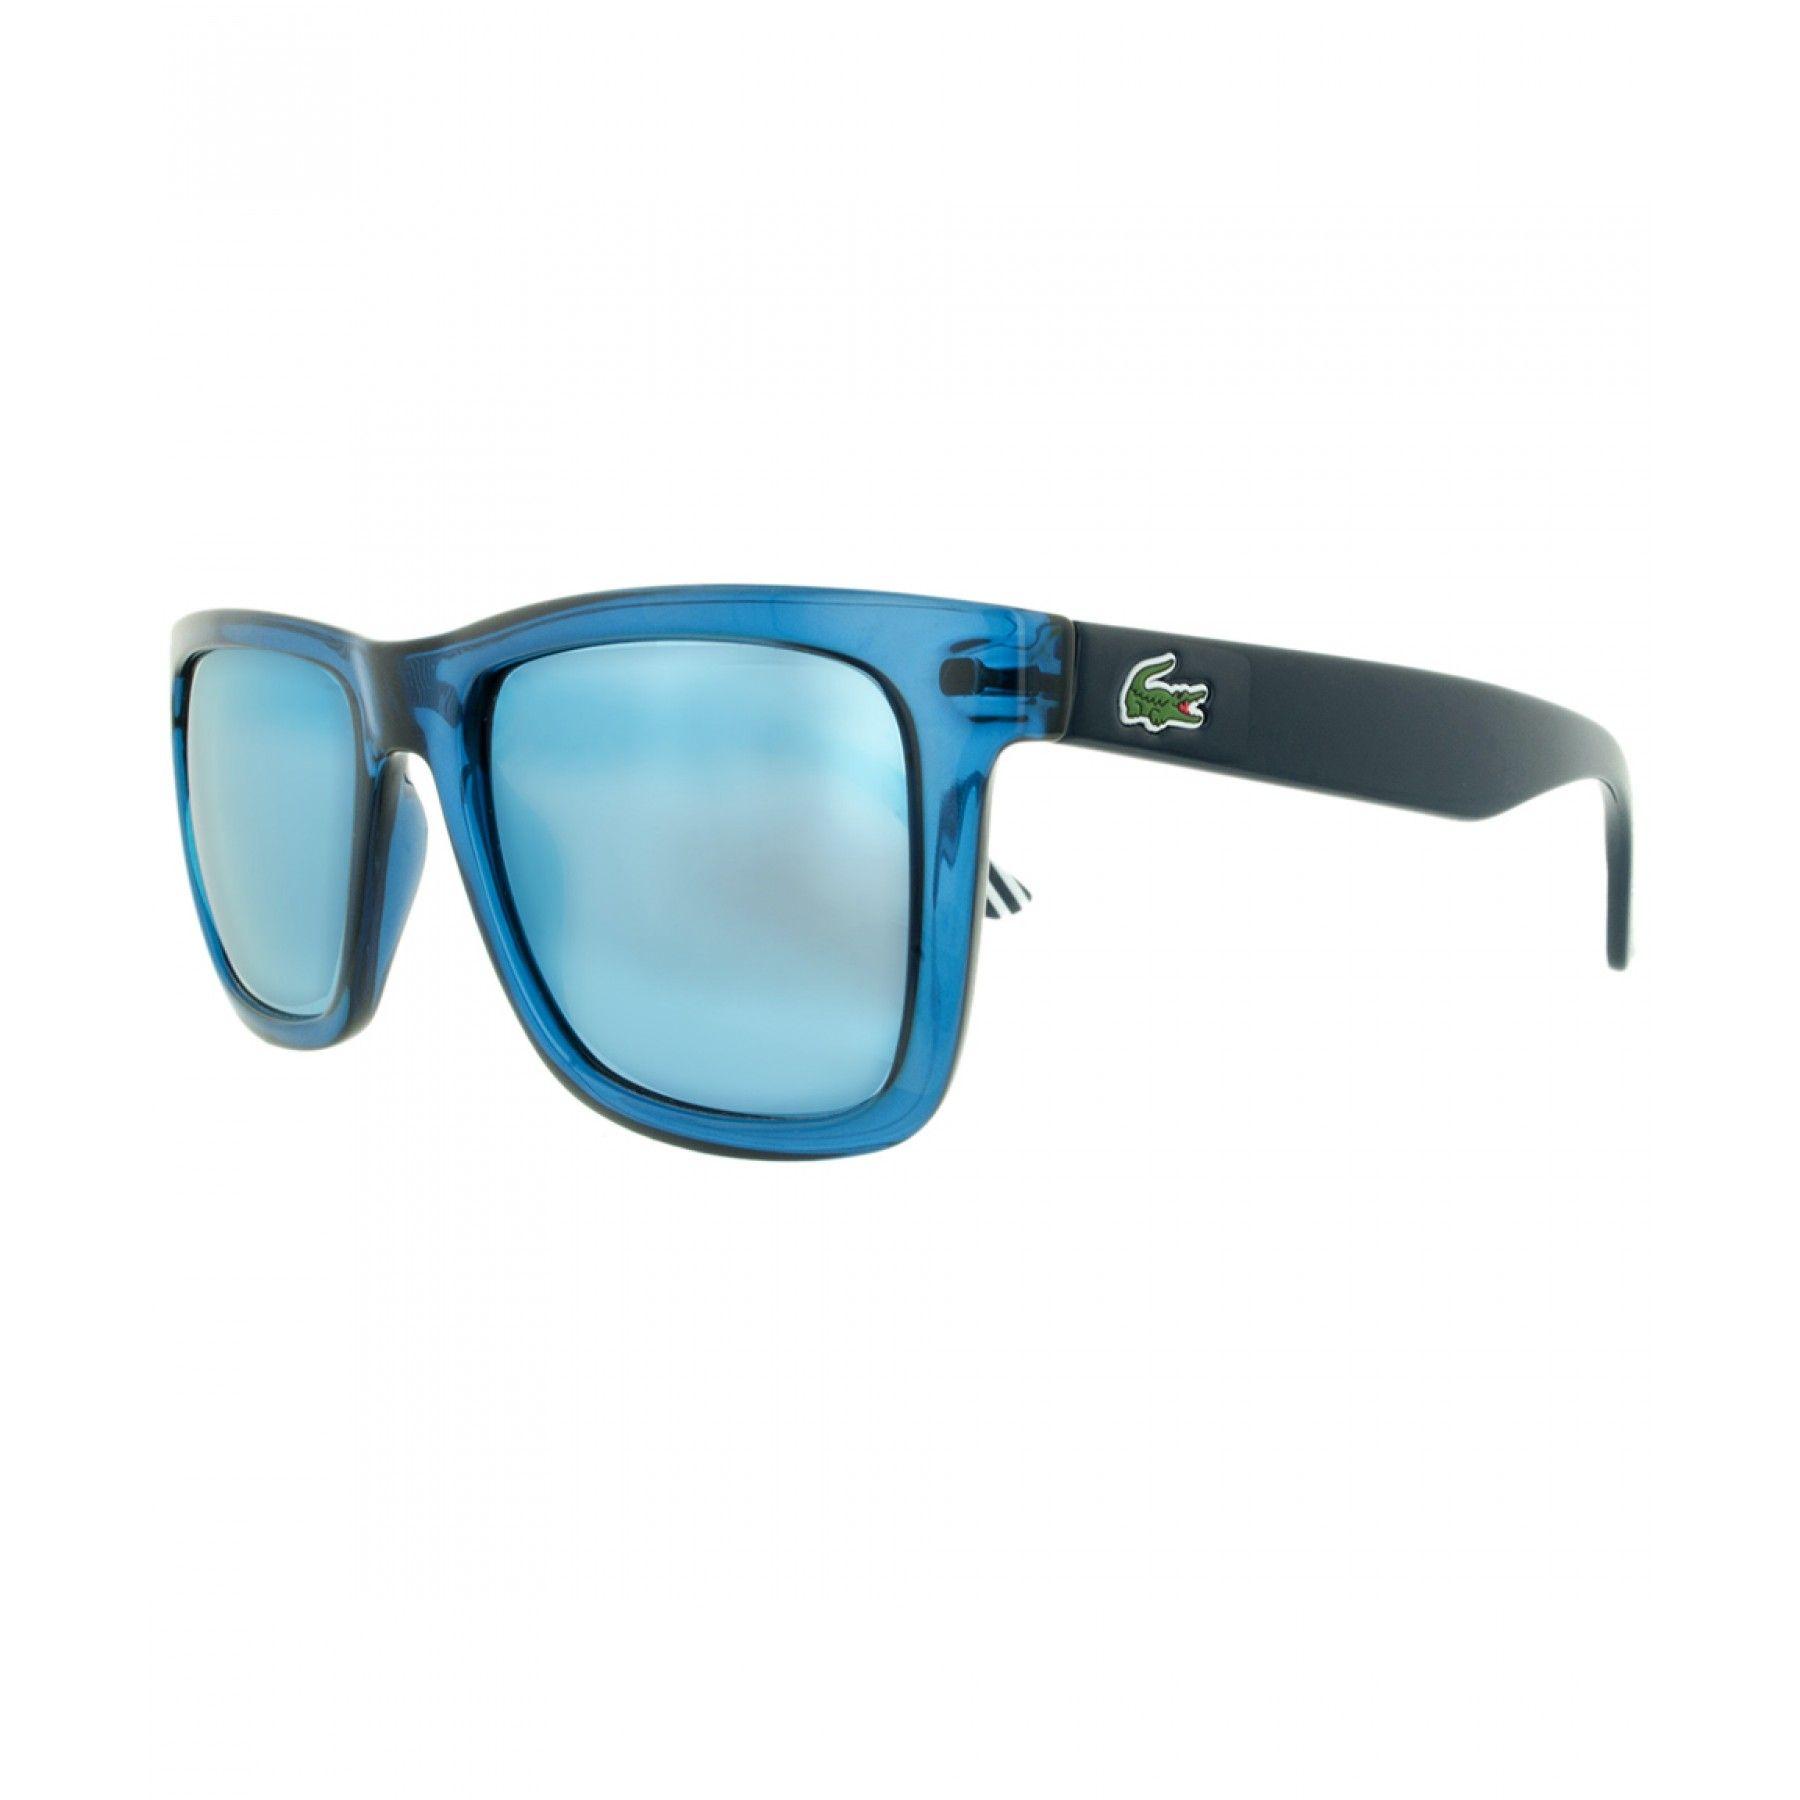 7b863cc51a Lente Solar Lacoste para hombre elaborado en material sintético color azul;  la marca se expresa